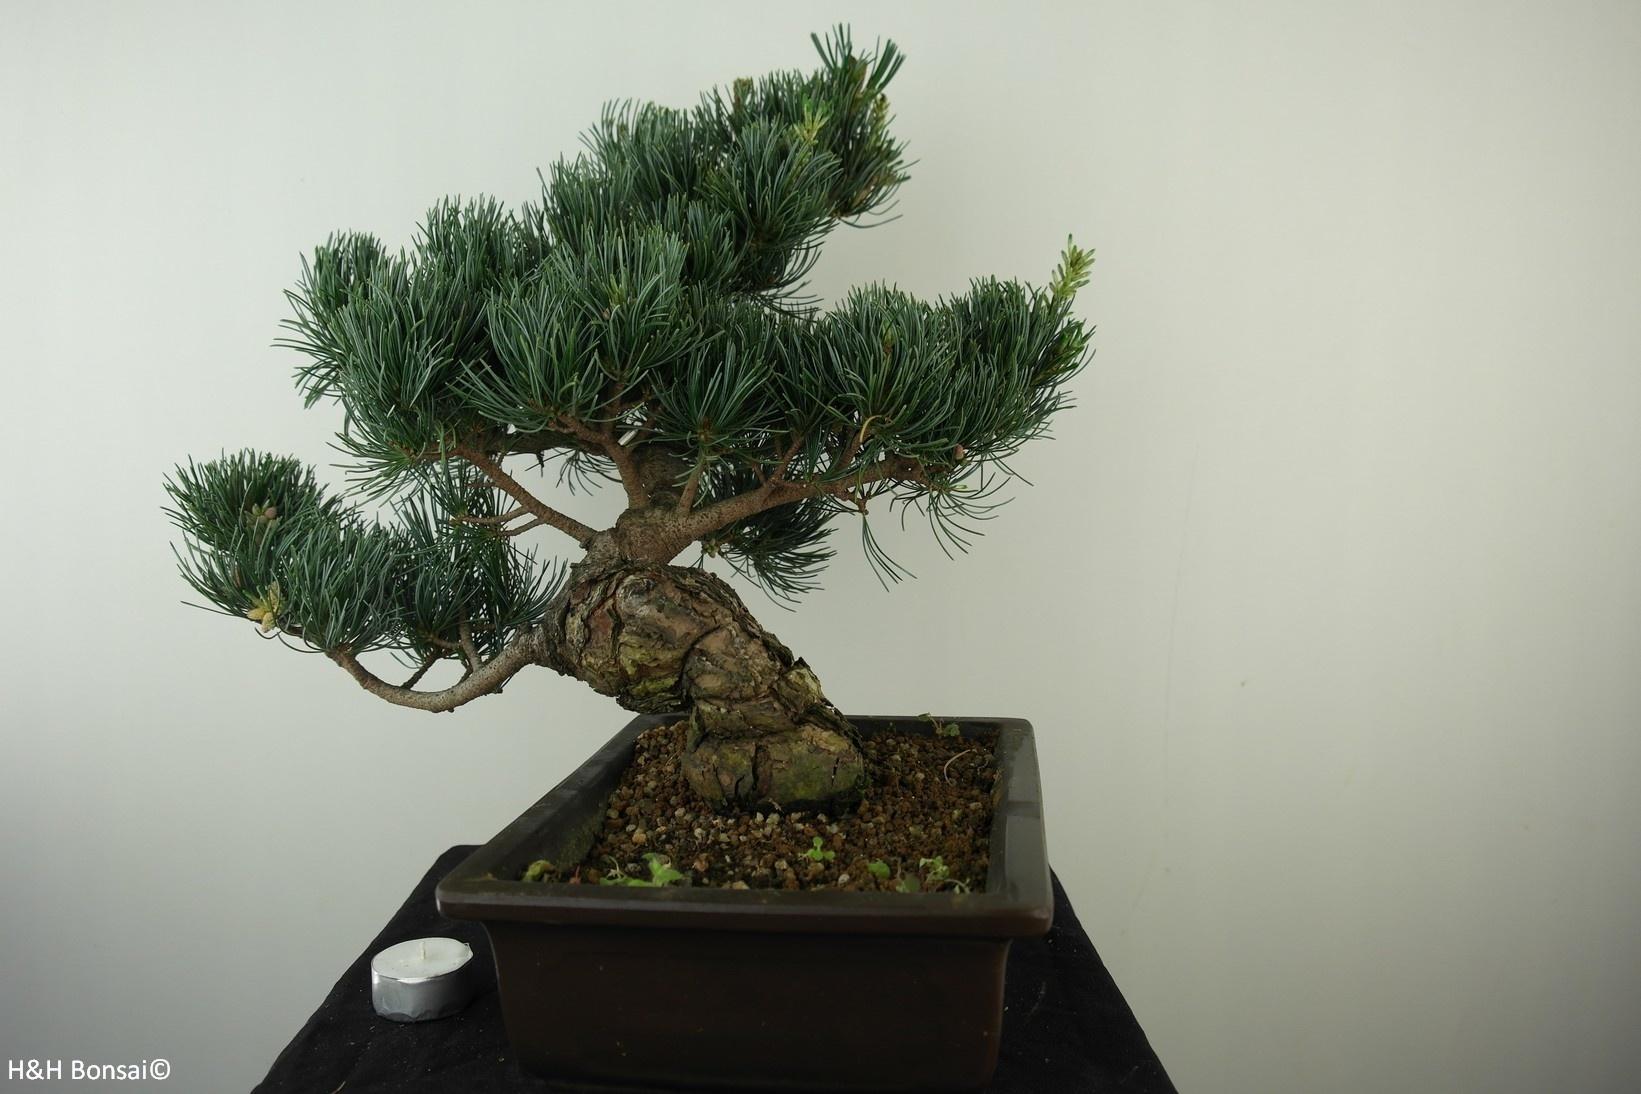 Bonsai Pino bianco, Pinus pentaphylla, no. 7813